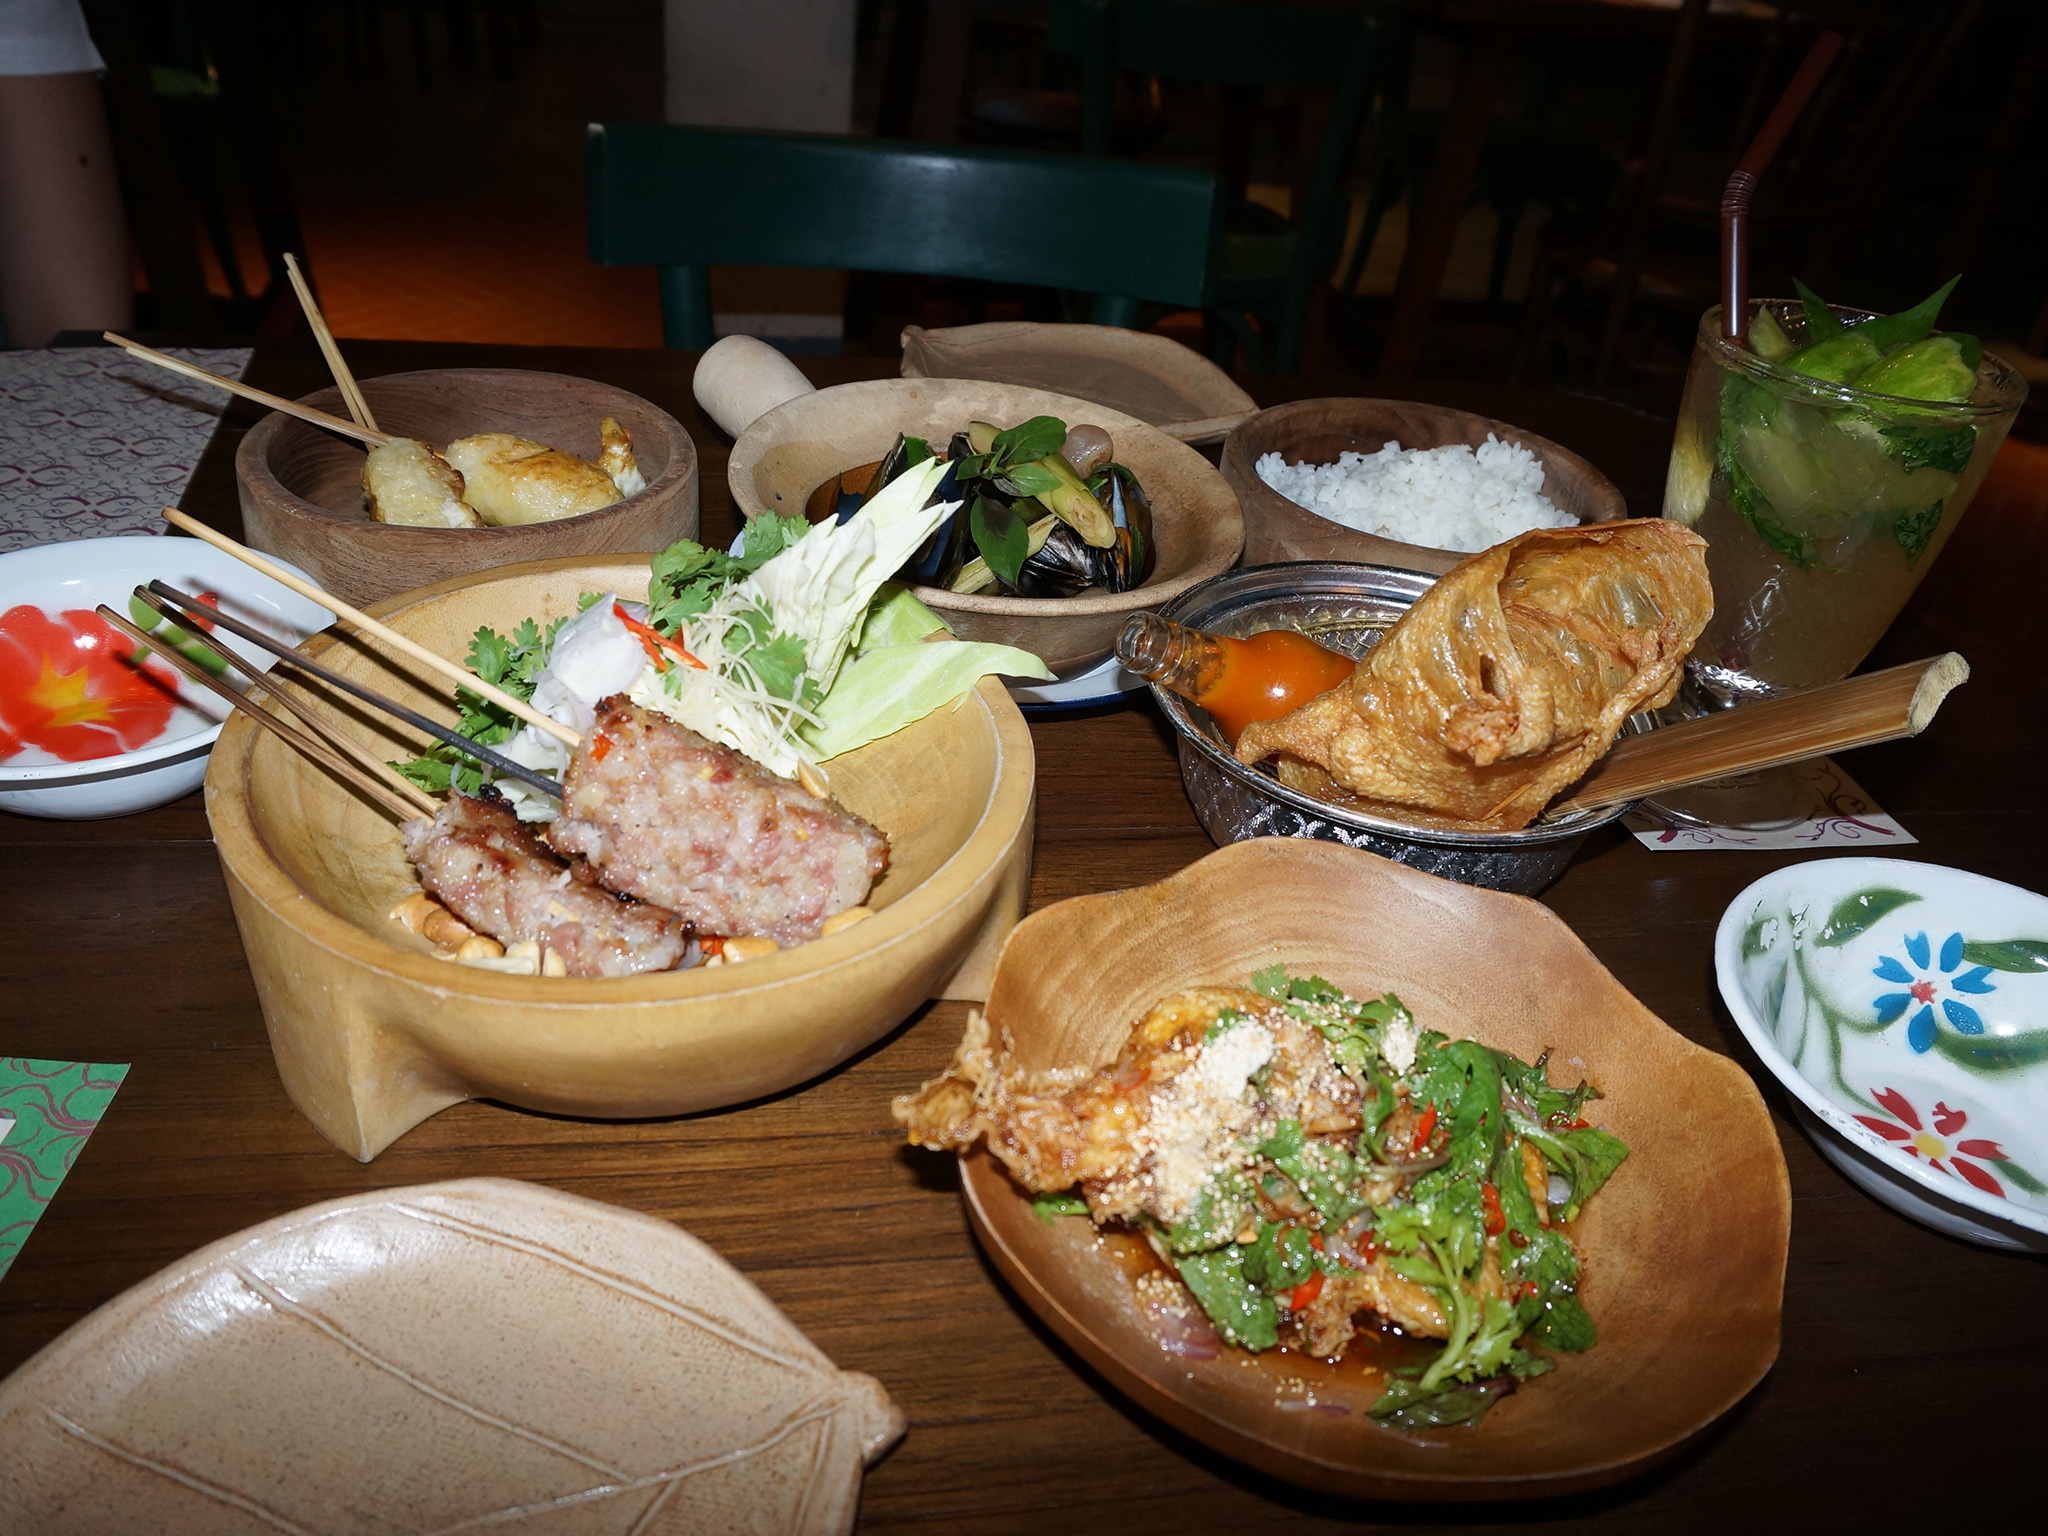 Thai-style meal